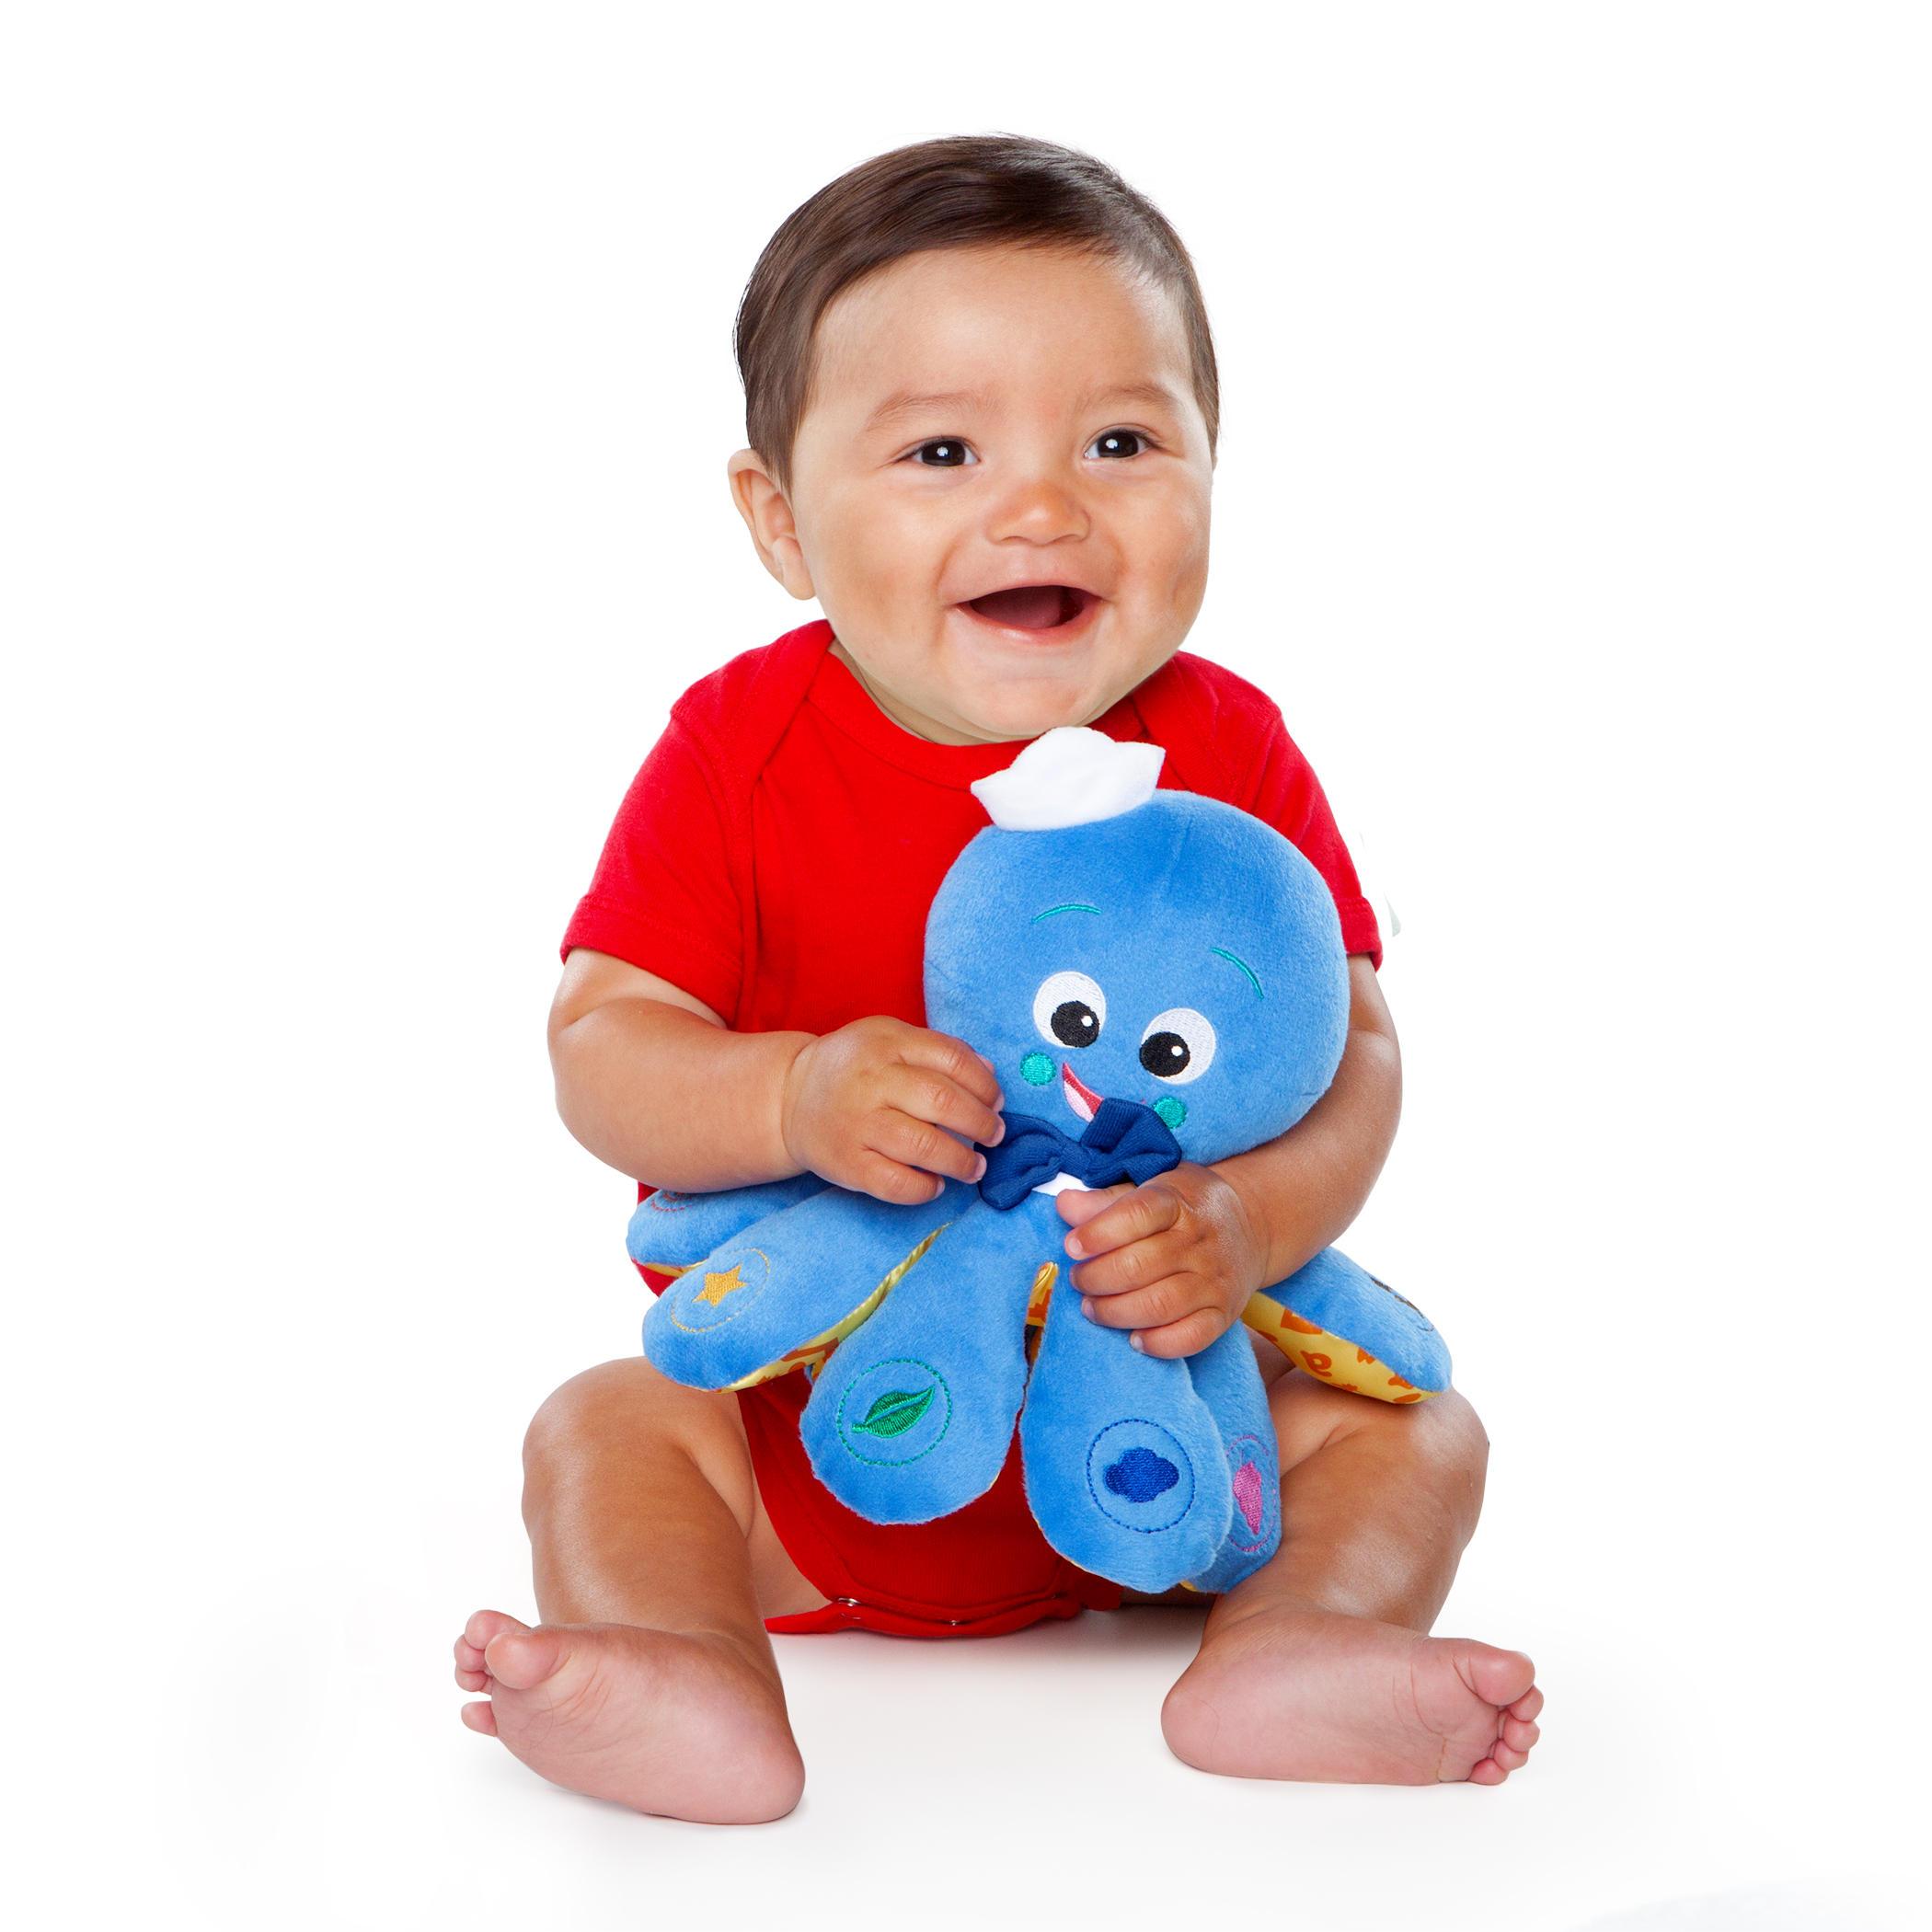 Octoplush™ Plush Toy